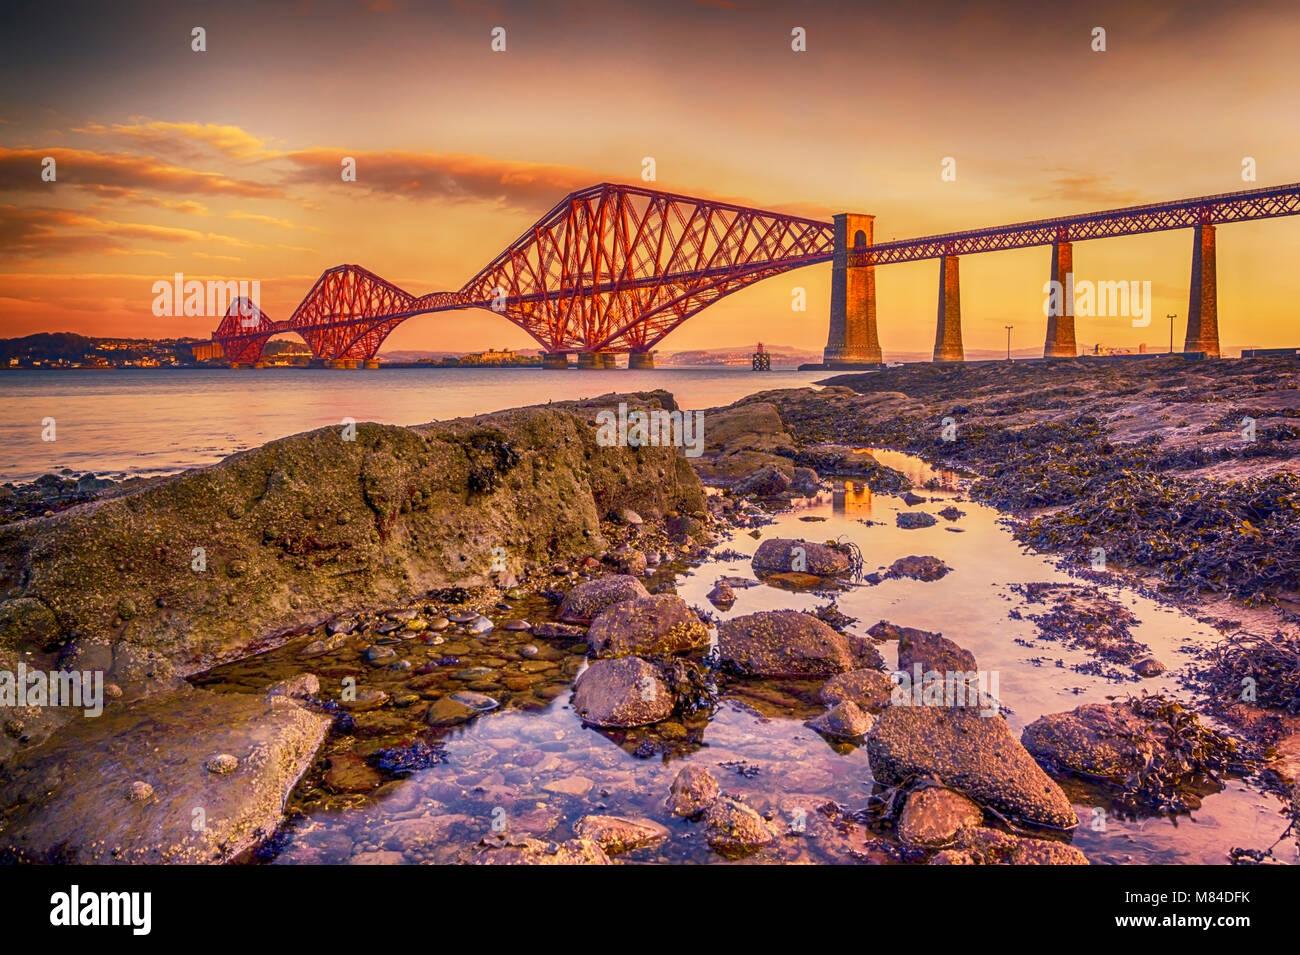 Die Forth Bridge, Schottland, Aalen in der niedrigen winter Morgen Sonne. Stockbild